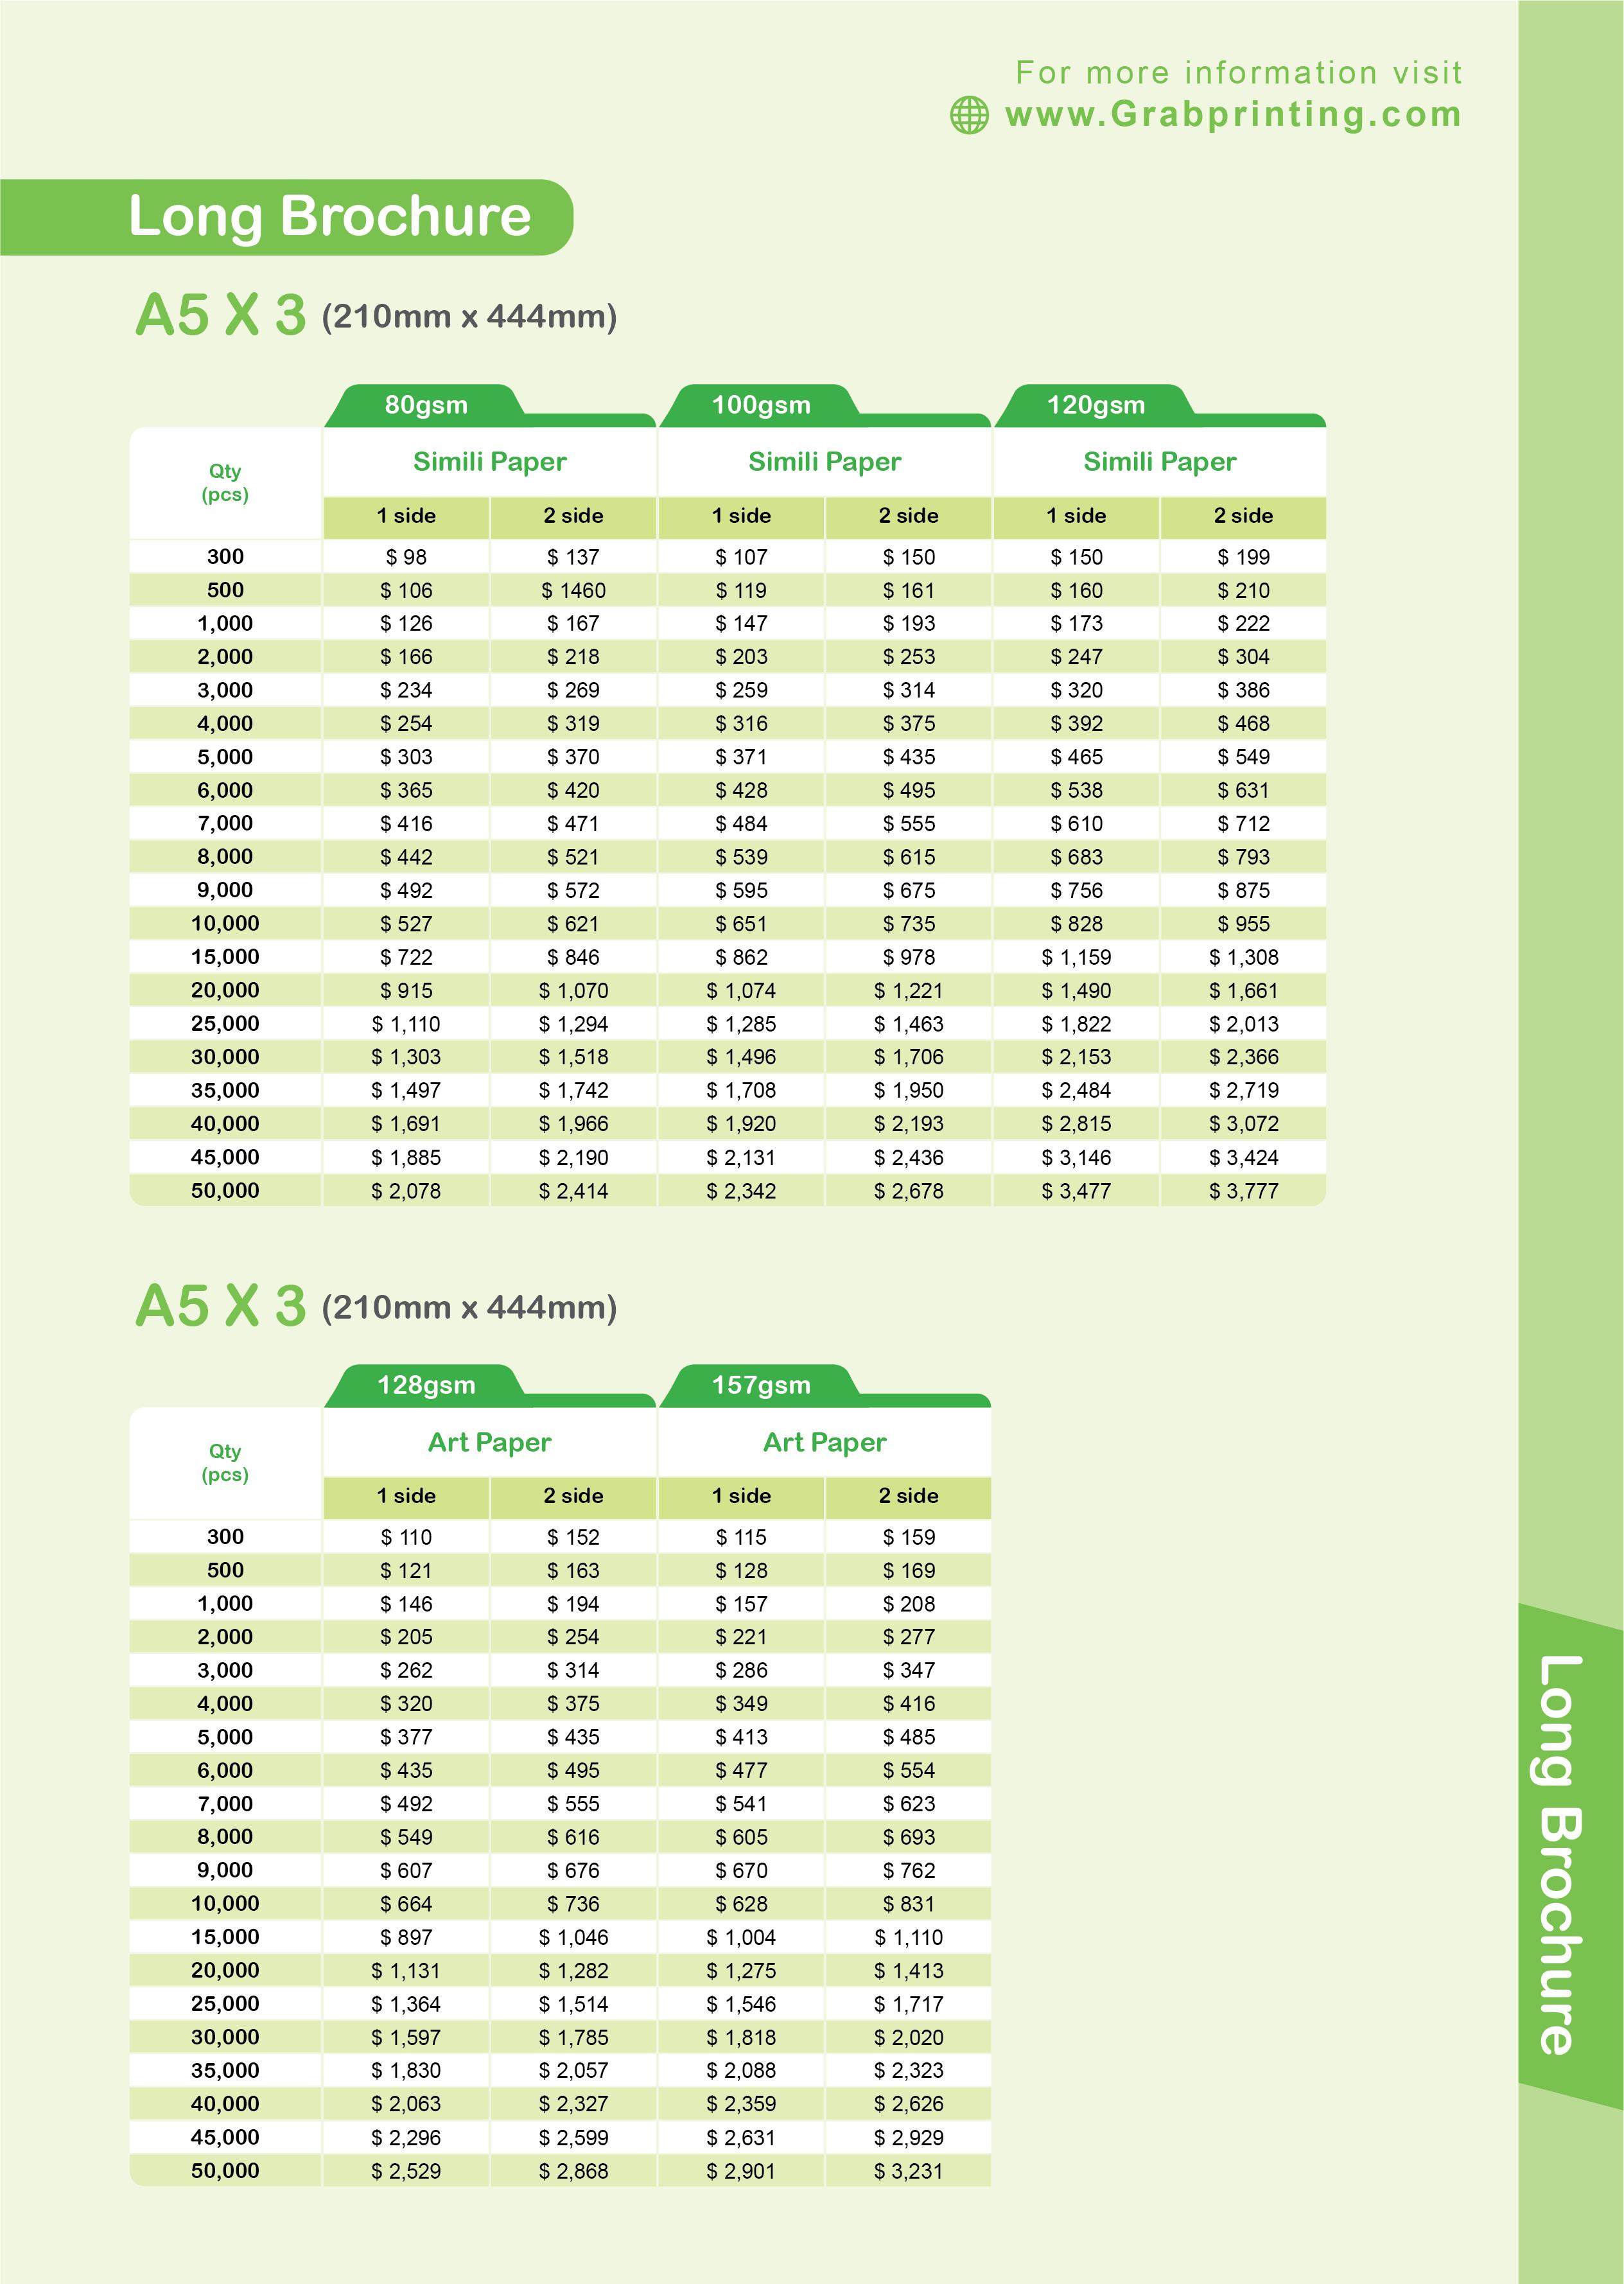 brochure printing Brochure Printing Long Brochure A5 x 3 Paper Price List